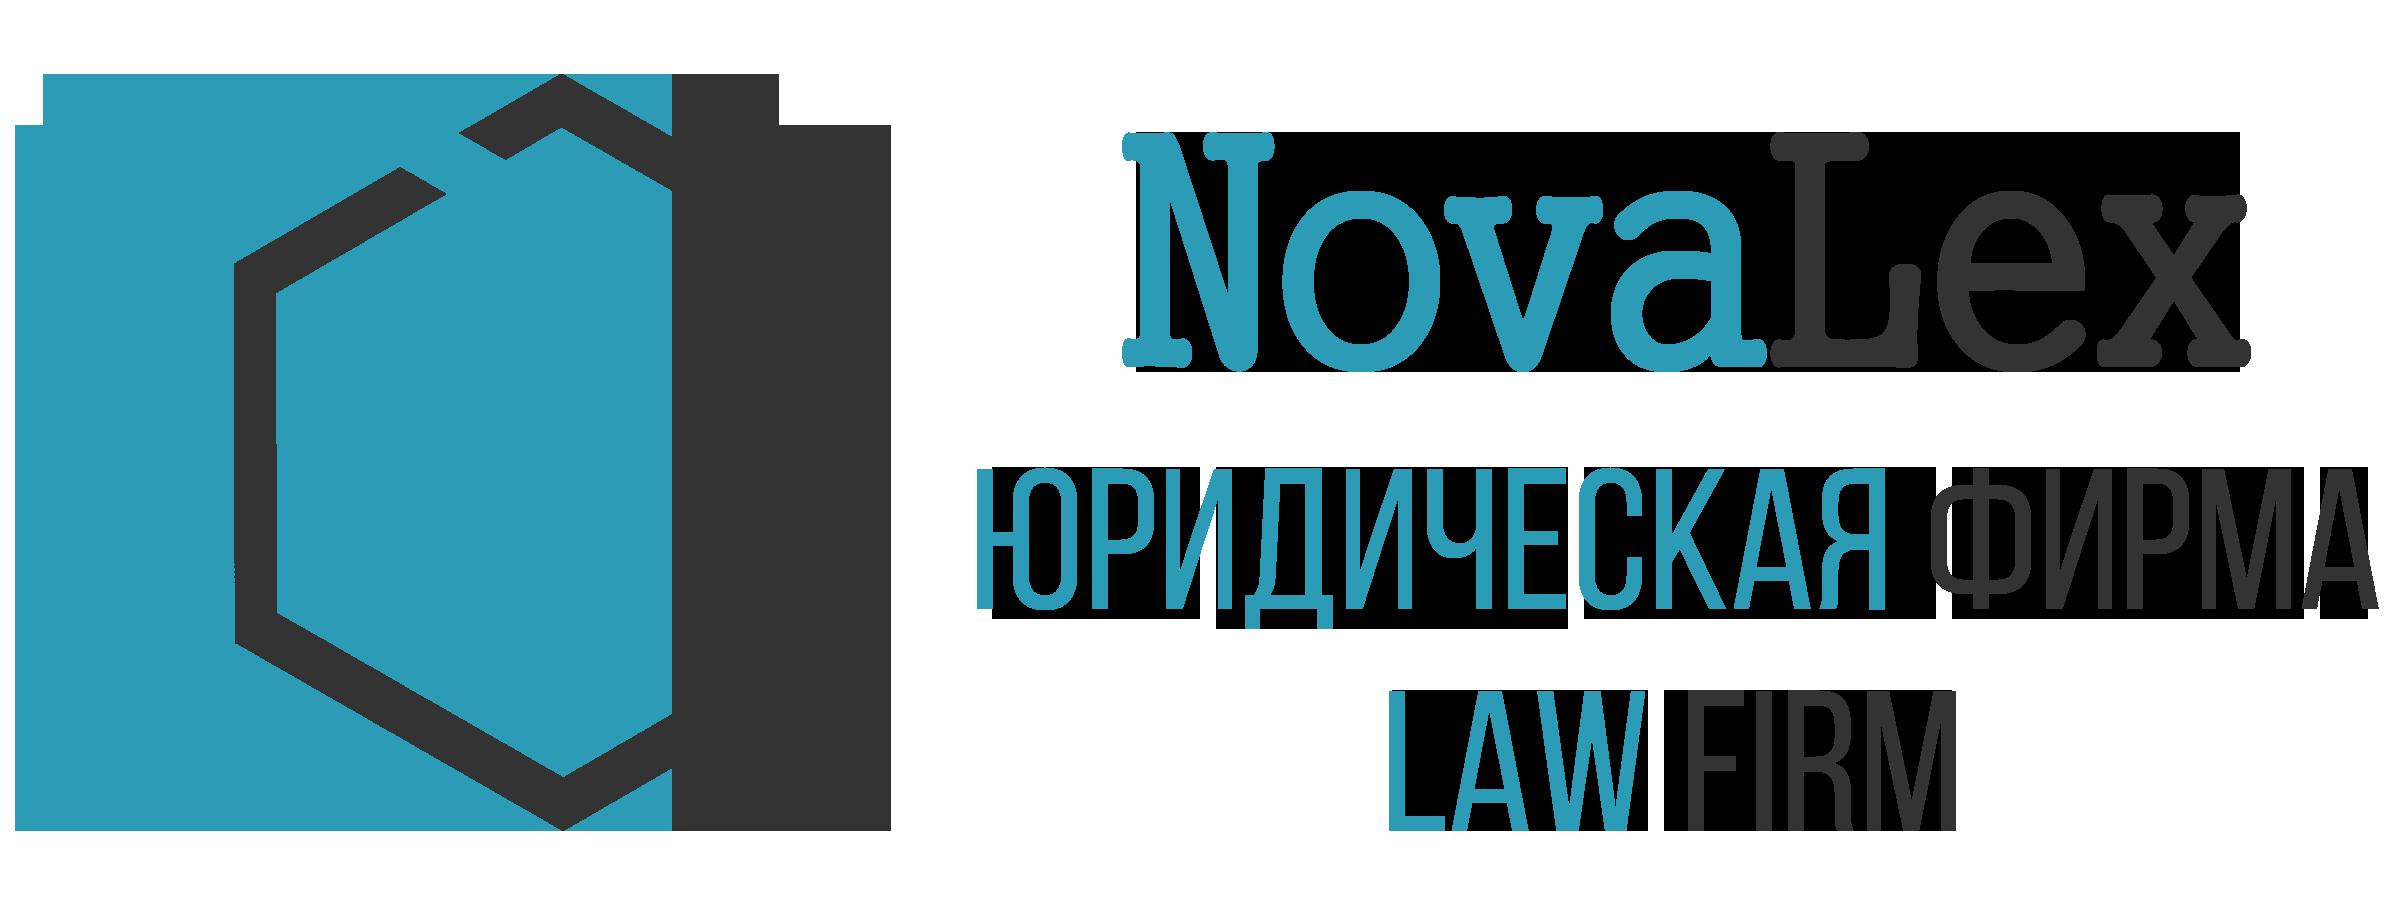 Помощь в корпоративное право